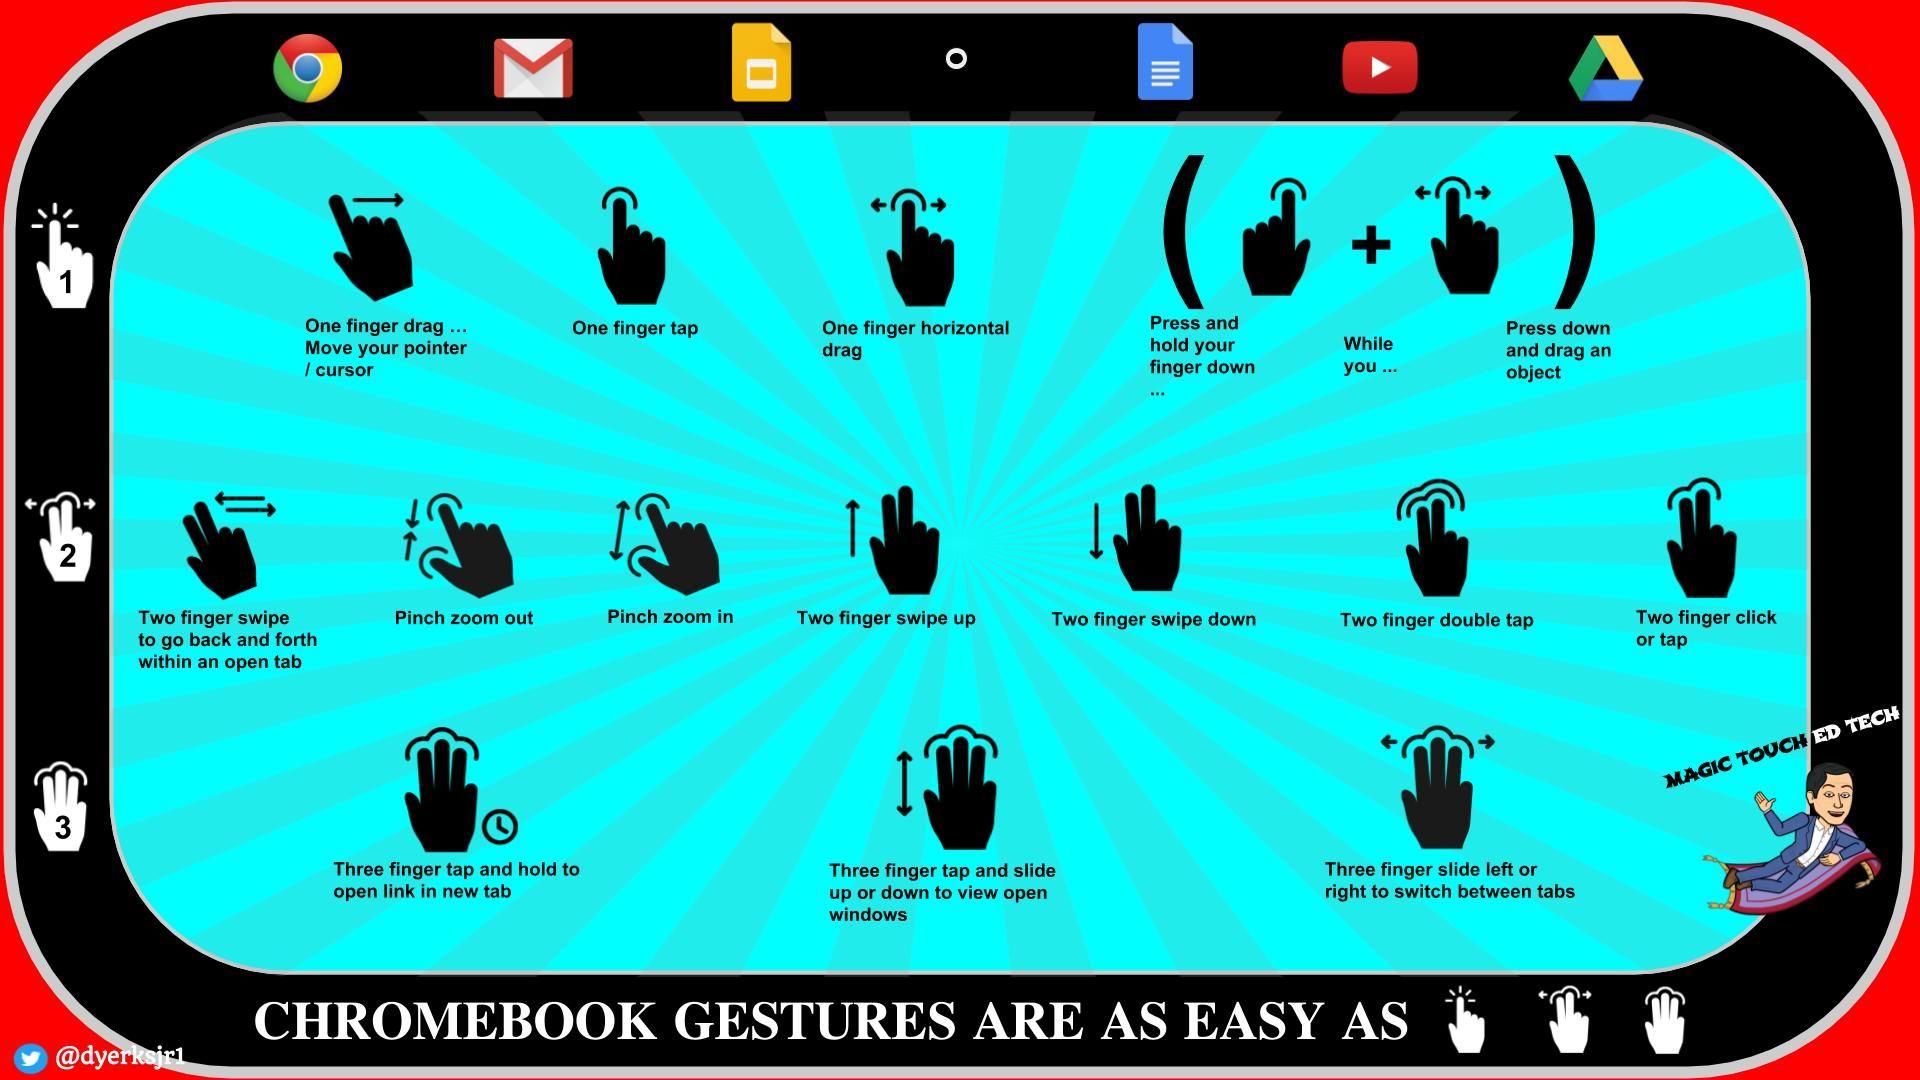 Chromebook Gestures Easy As Chromebook Easy Info